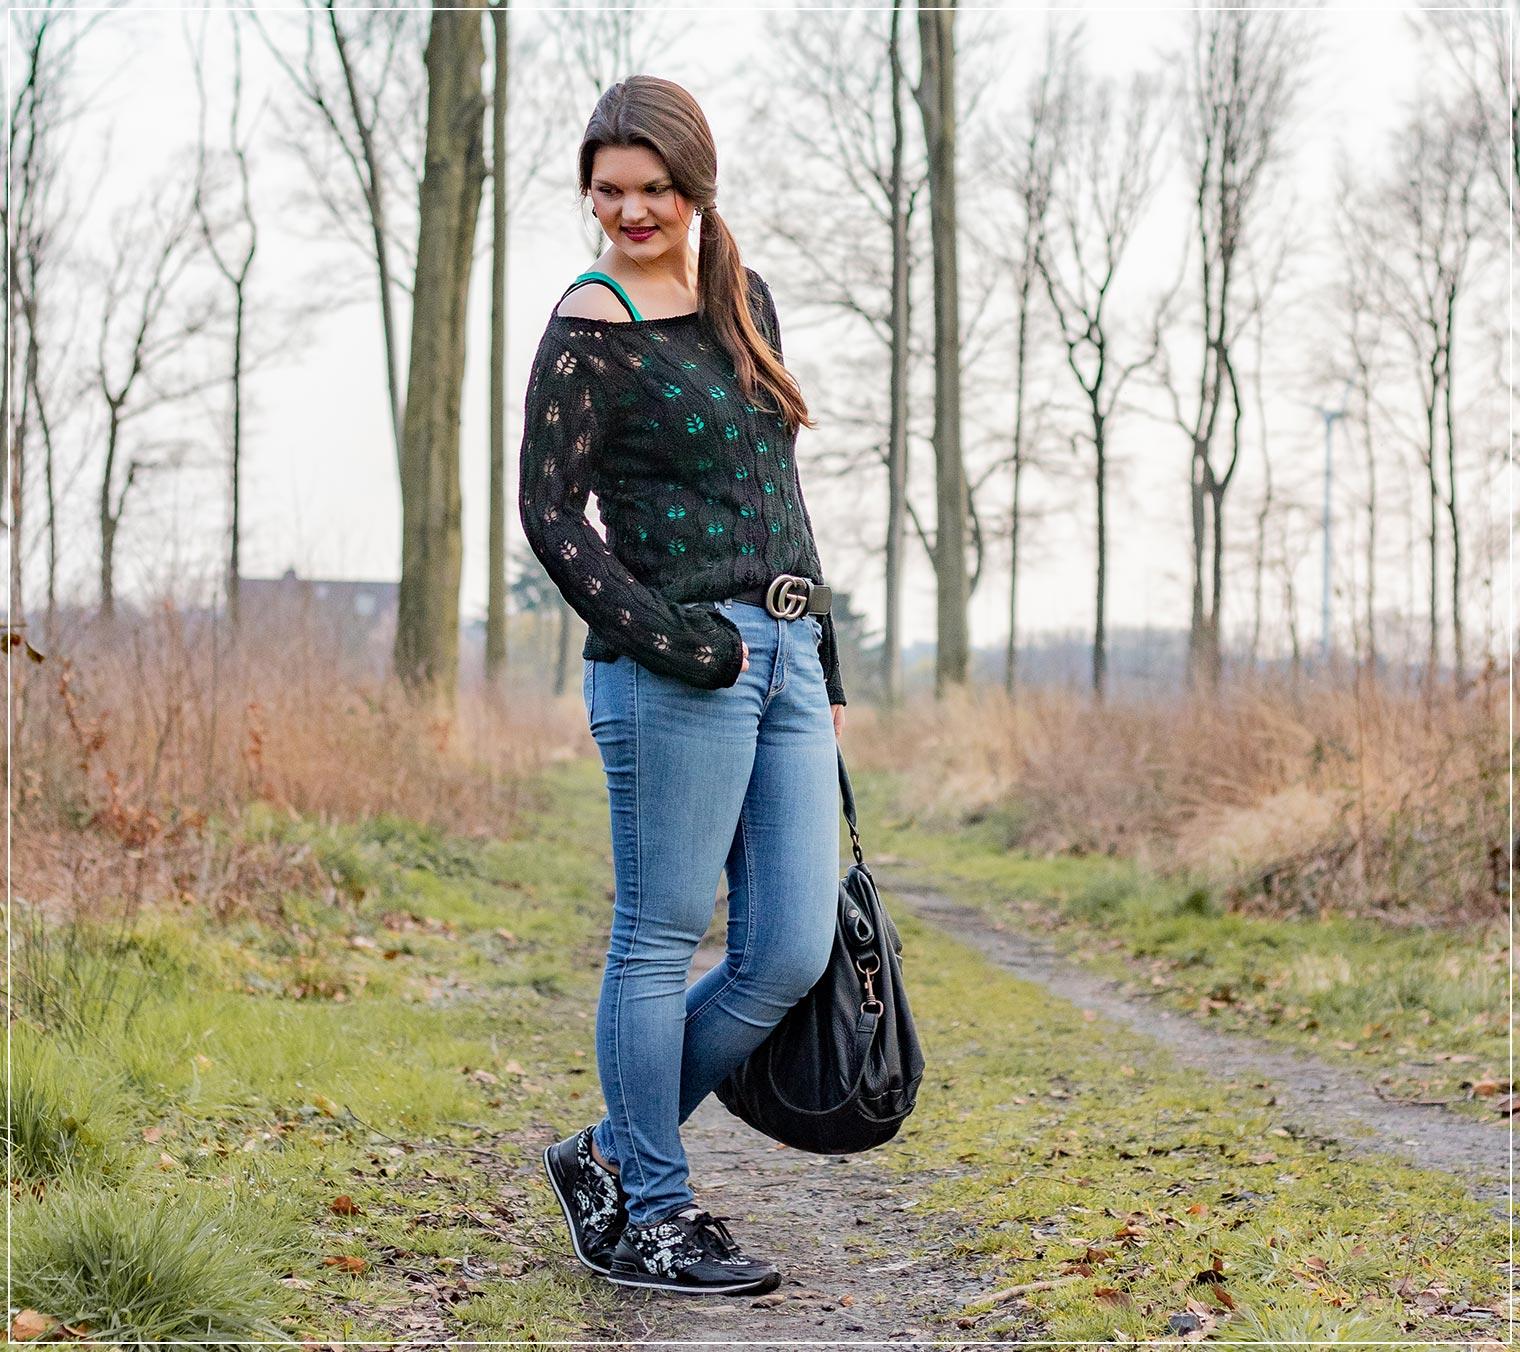 DIe Skinny Jeans als sportlicher Look im großen Jeans-Guide